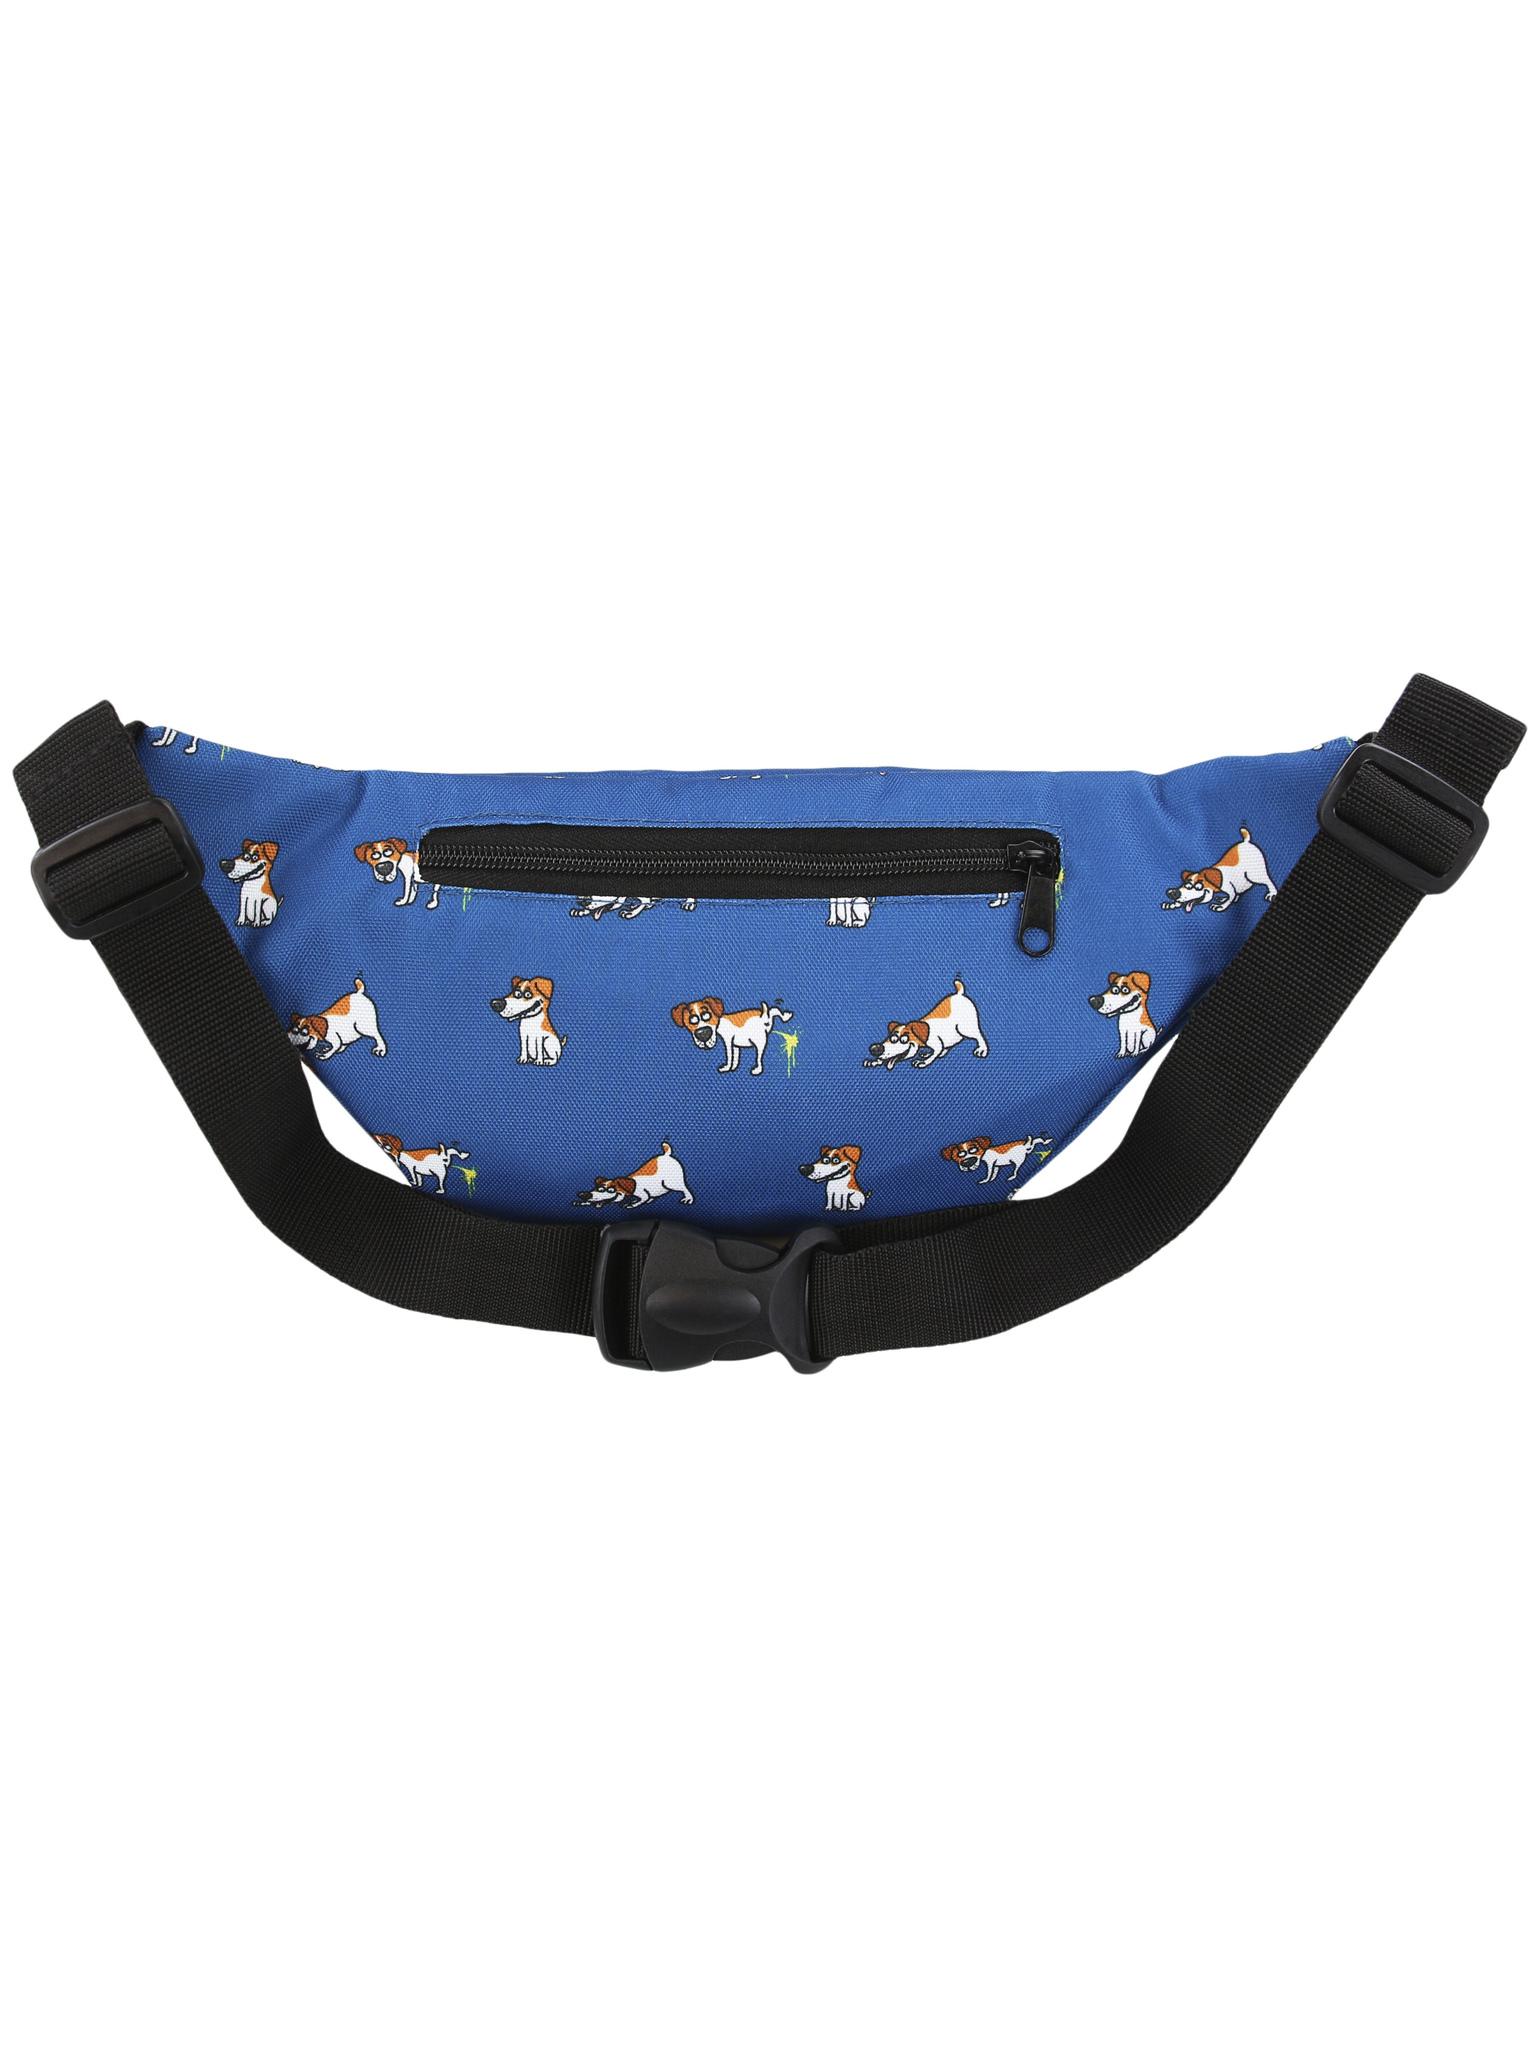 Поясная сумка Собака